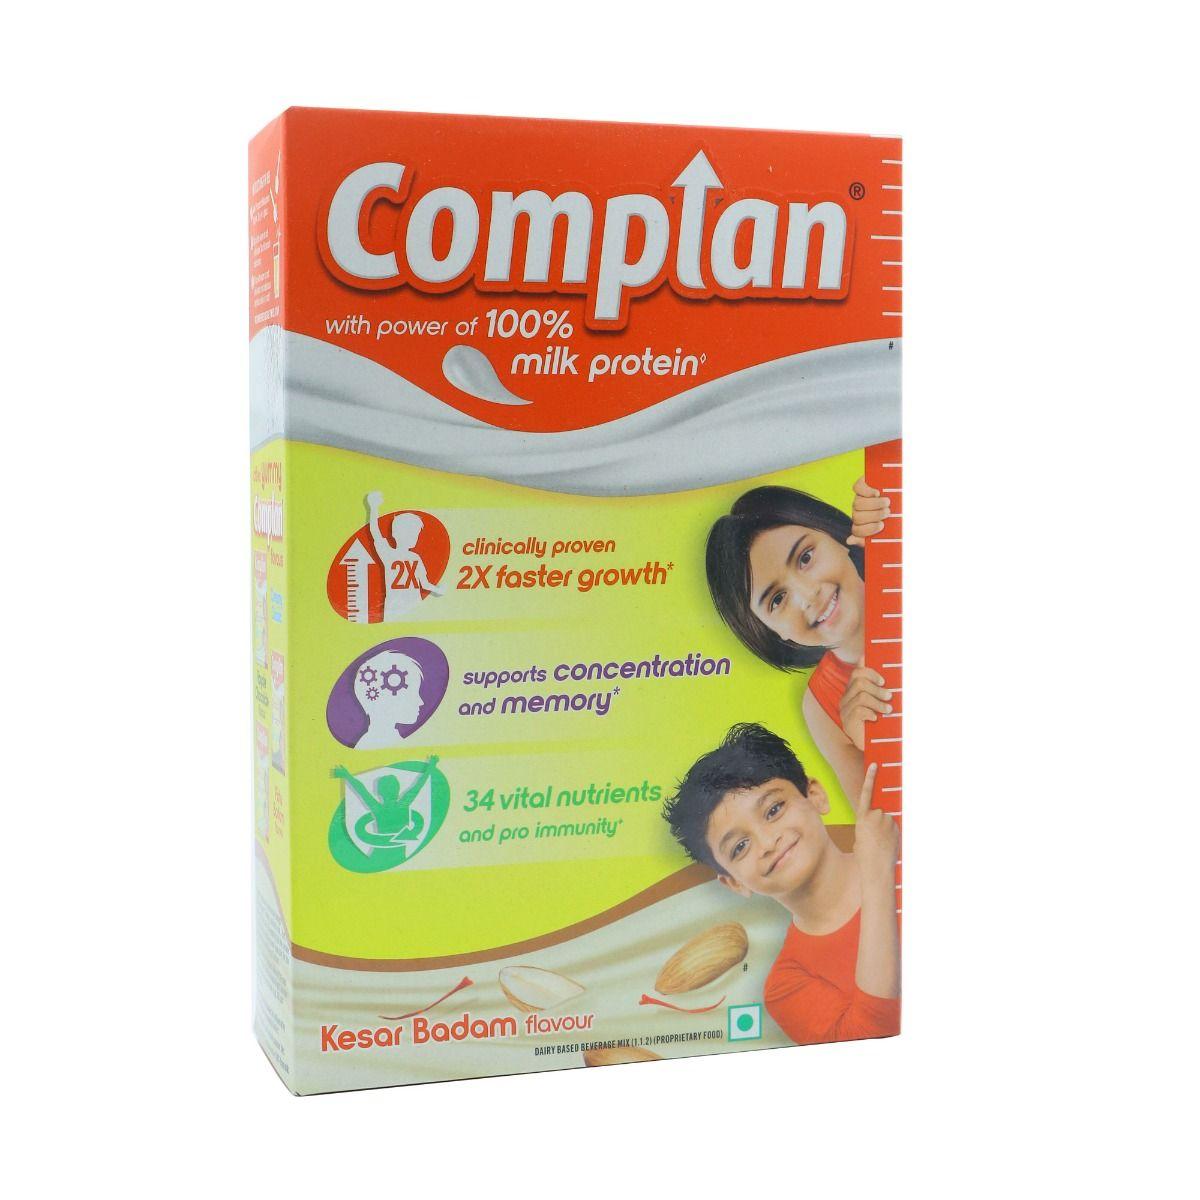 Complan Kesar Badam Flavoured Health & Nutrition Drink, 400 gm Refill Pack